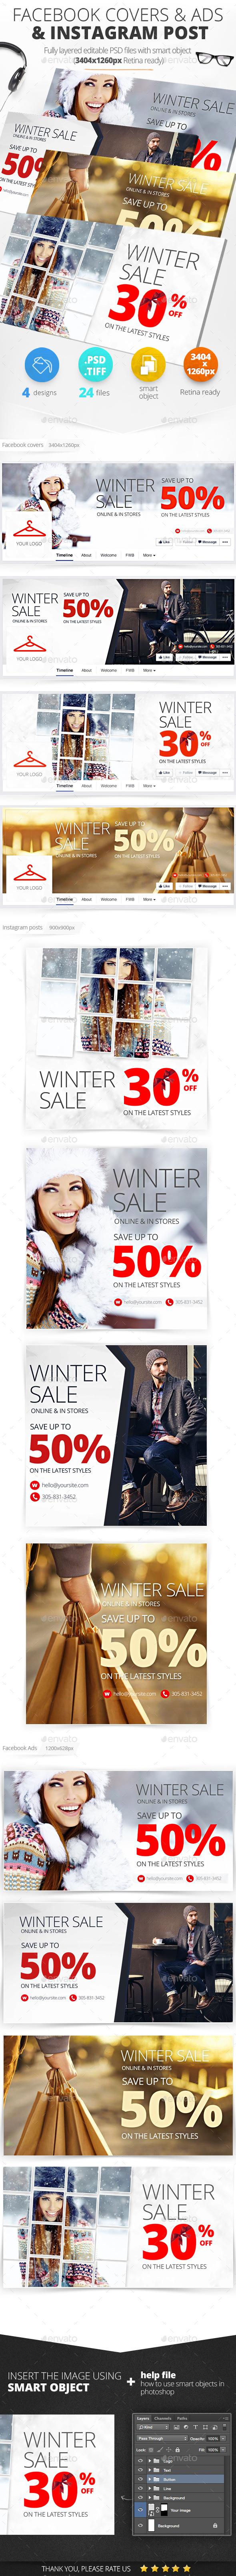 Facebook Covers & Ads & Instagram Post Sale Pack - Social Media Web Elements